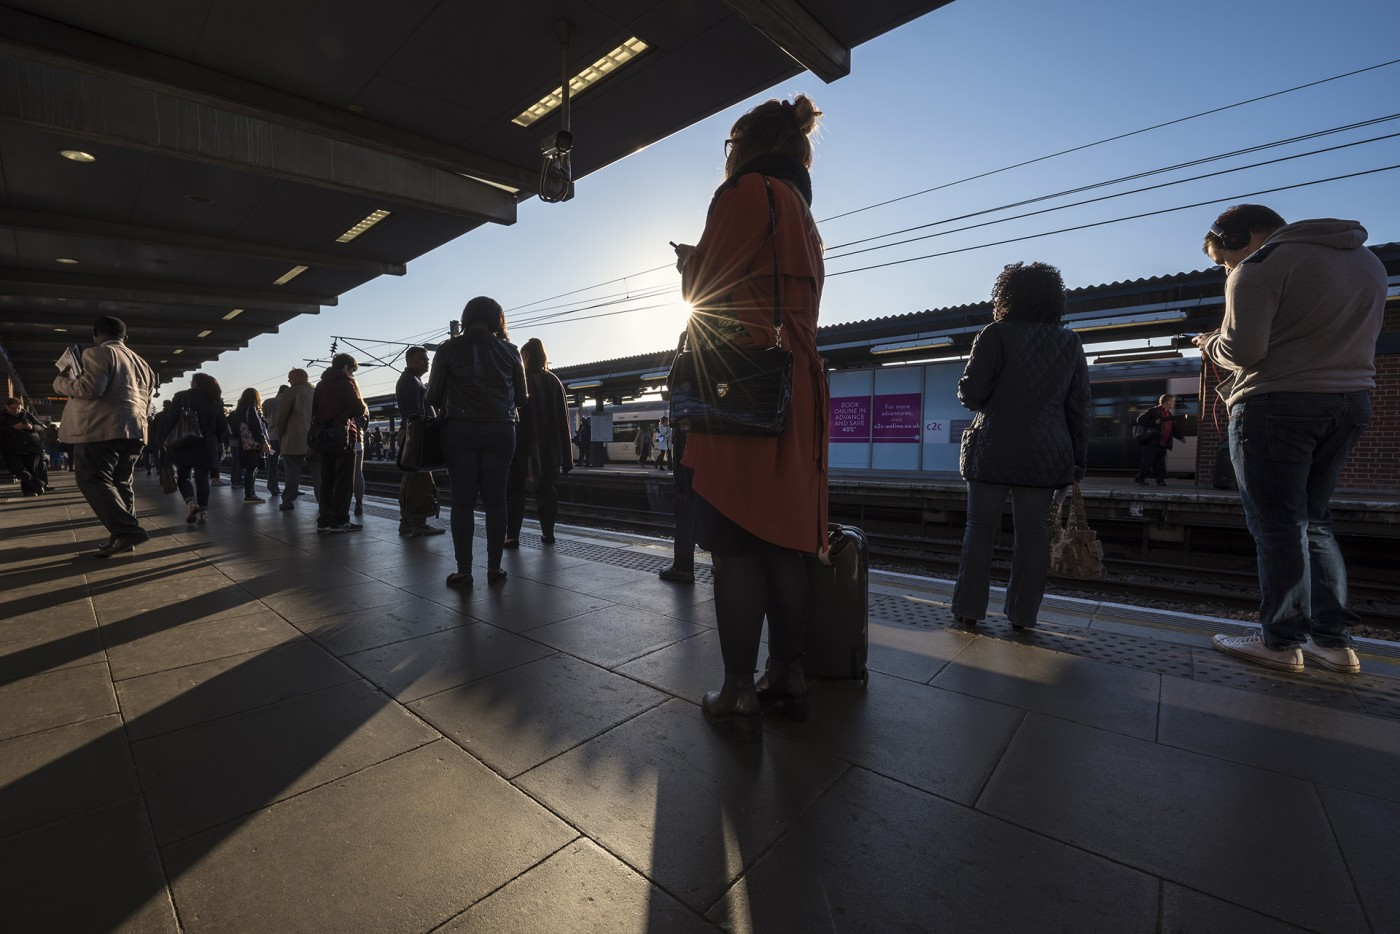 People in Transit